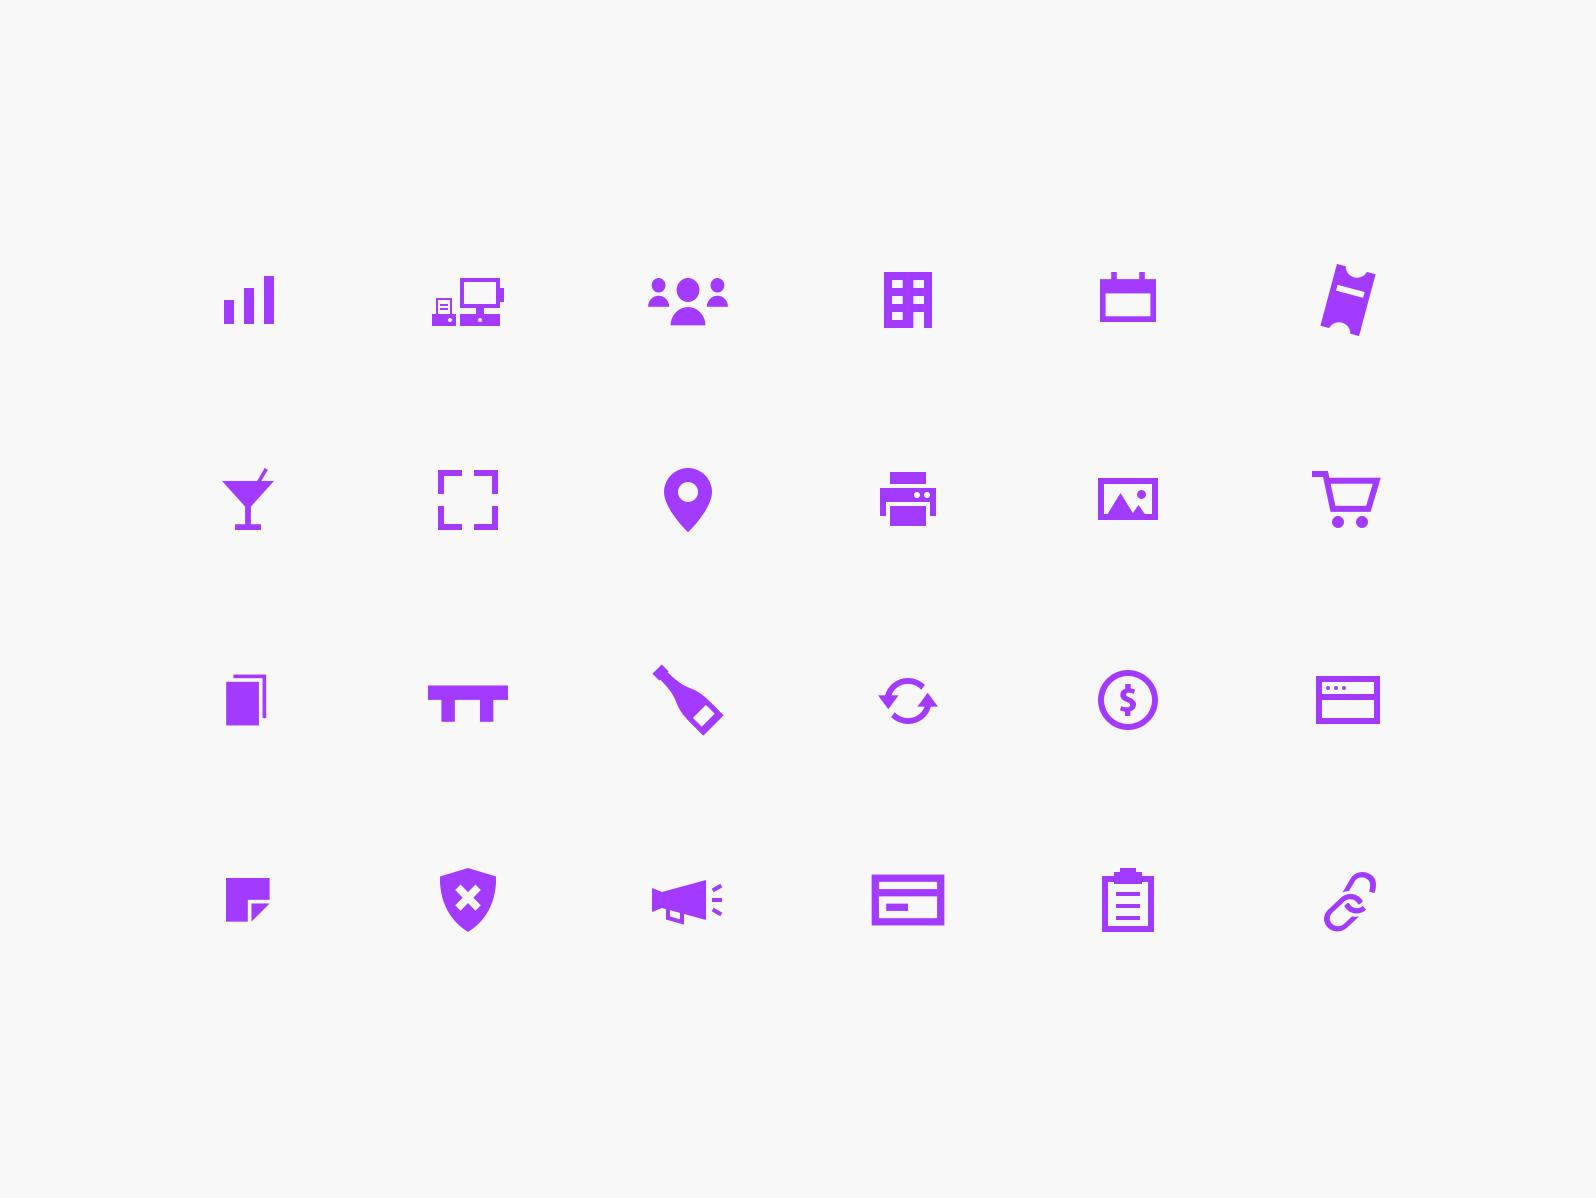 Tl dribbble icons